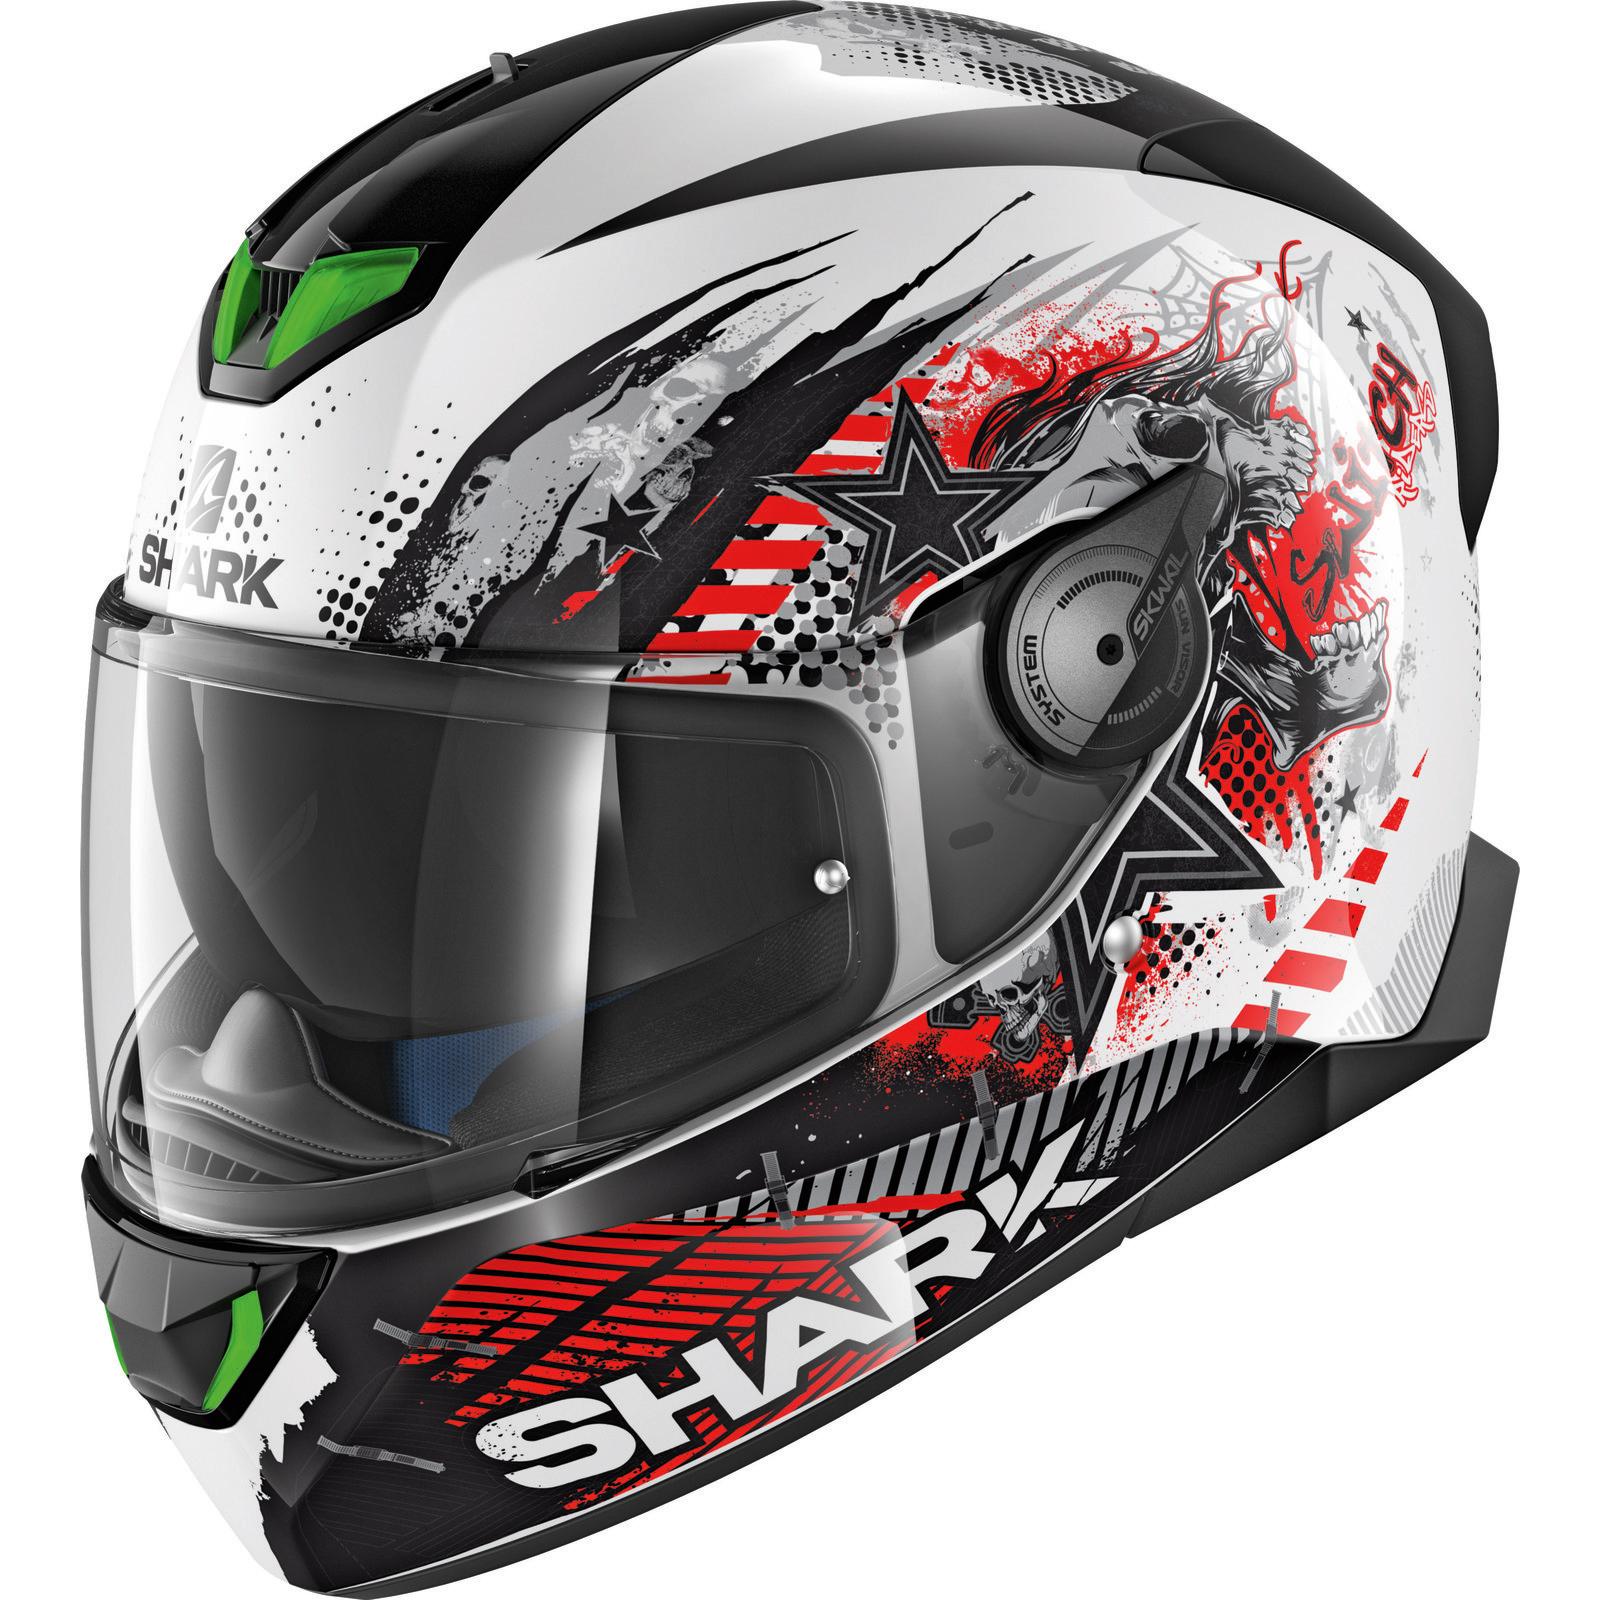 dd4c0f3659 Shark Skwal 2 Switch Rider 1 Motorcycle Helmet   Visor LED Full Face ...